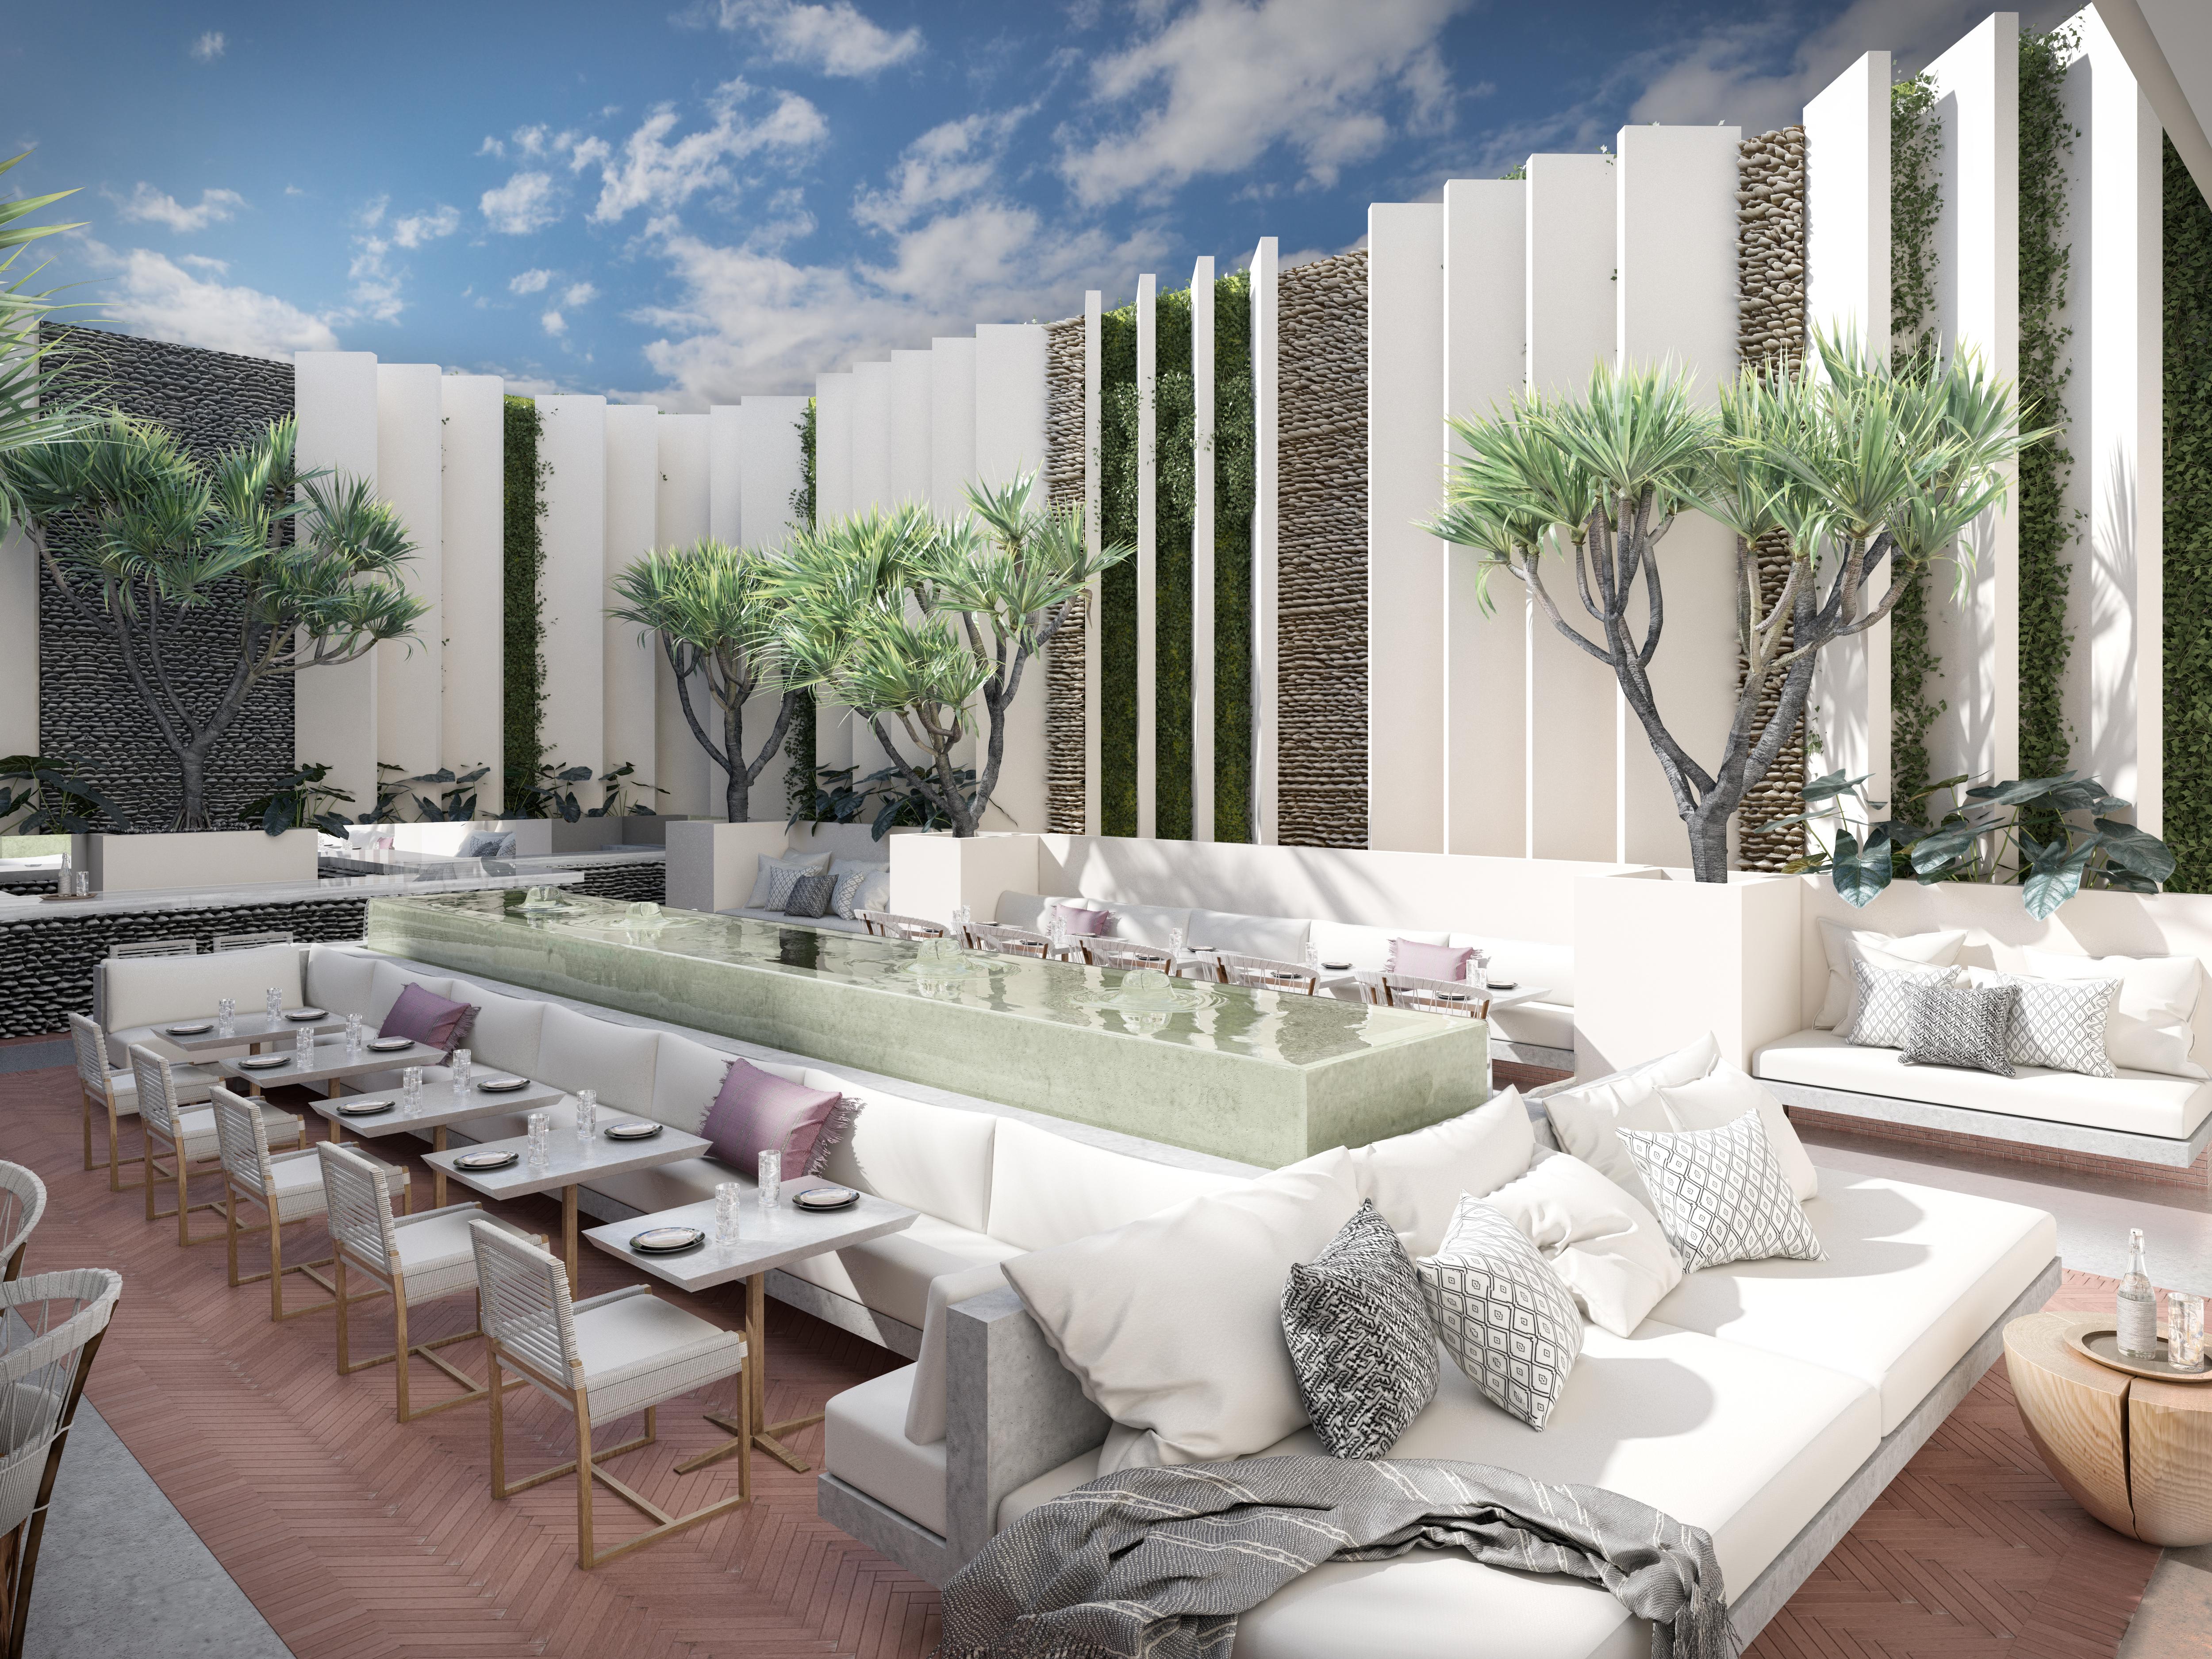 Hotel Amapa_Courtyard Render